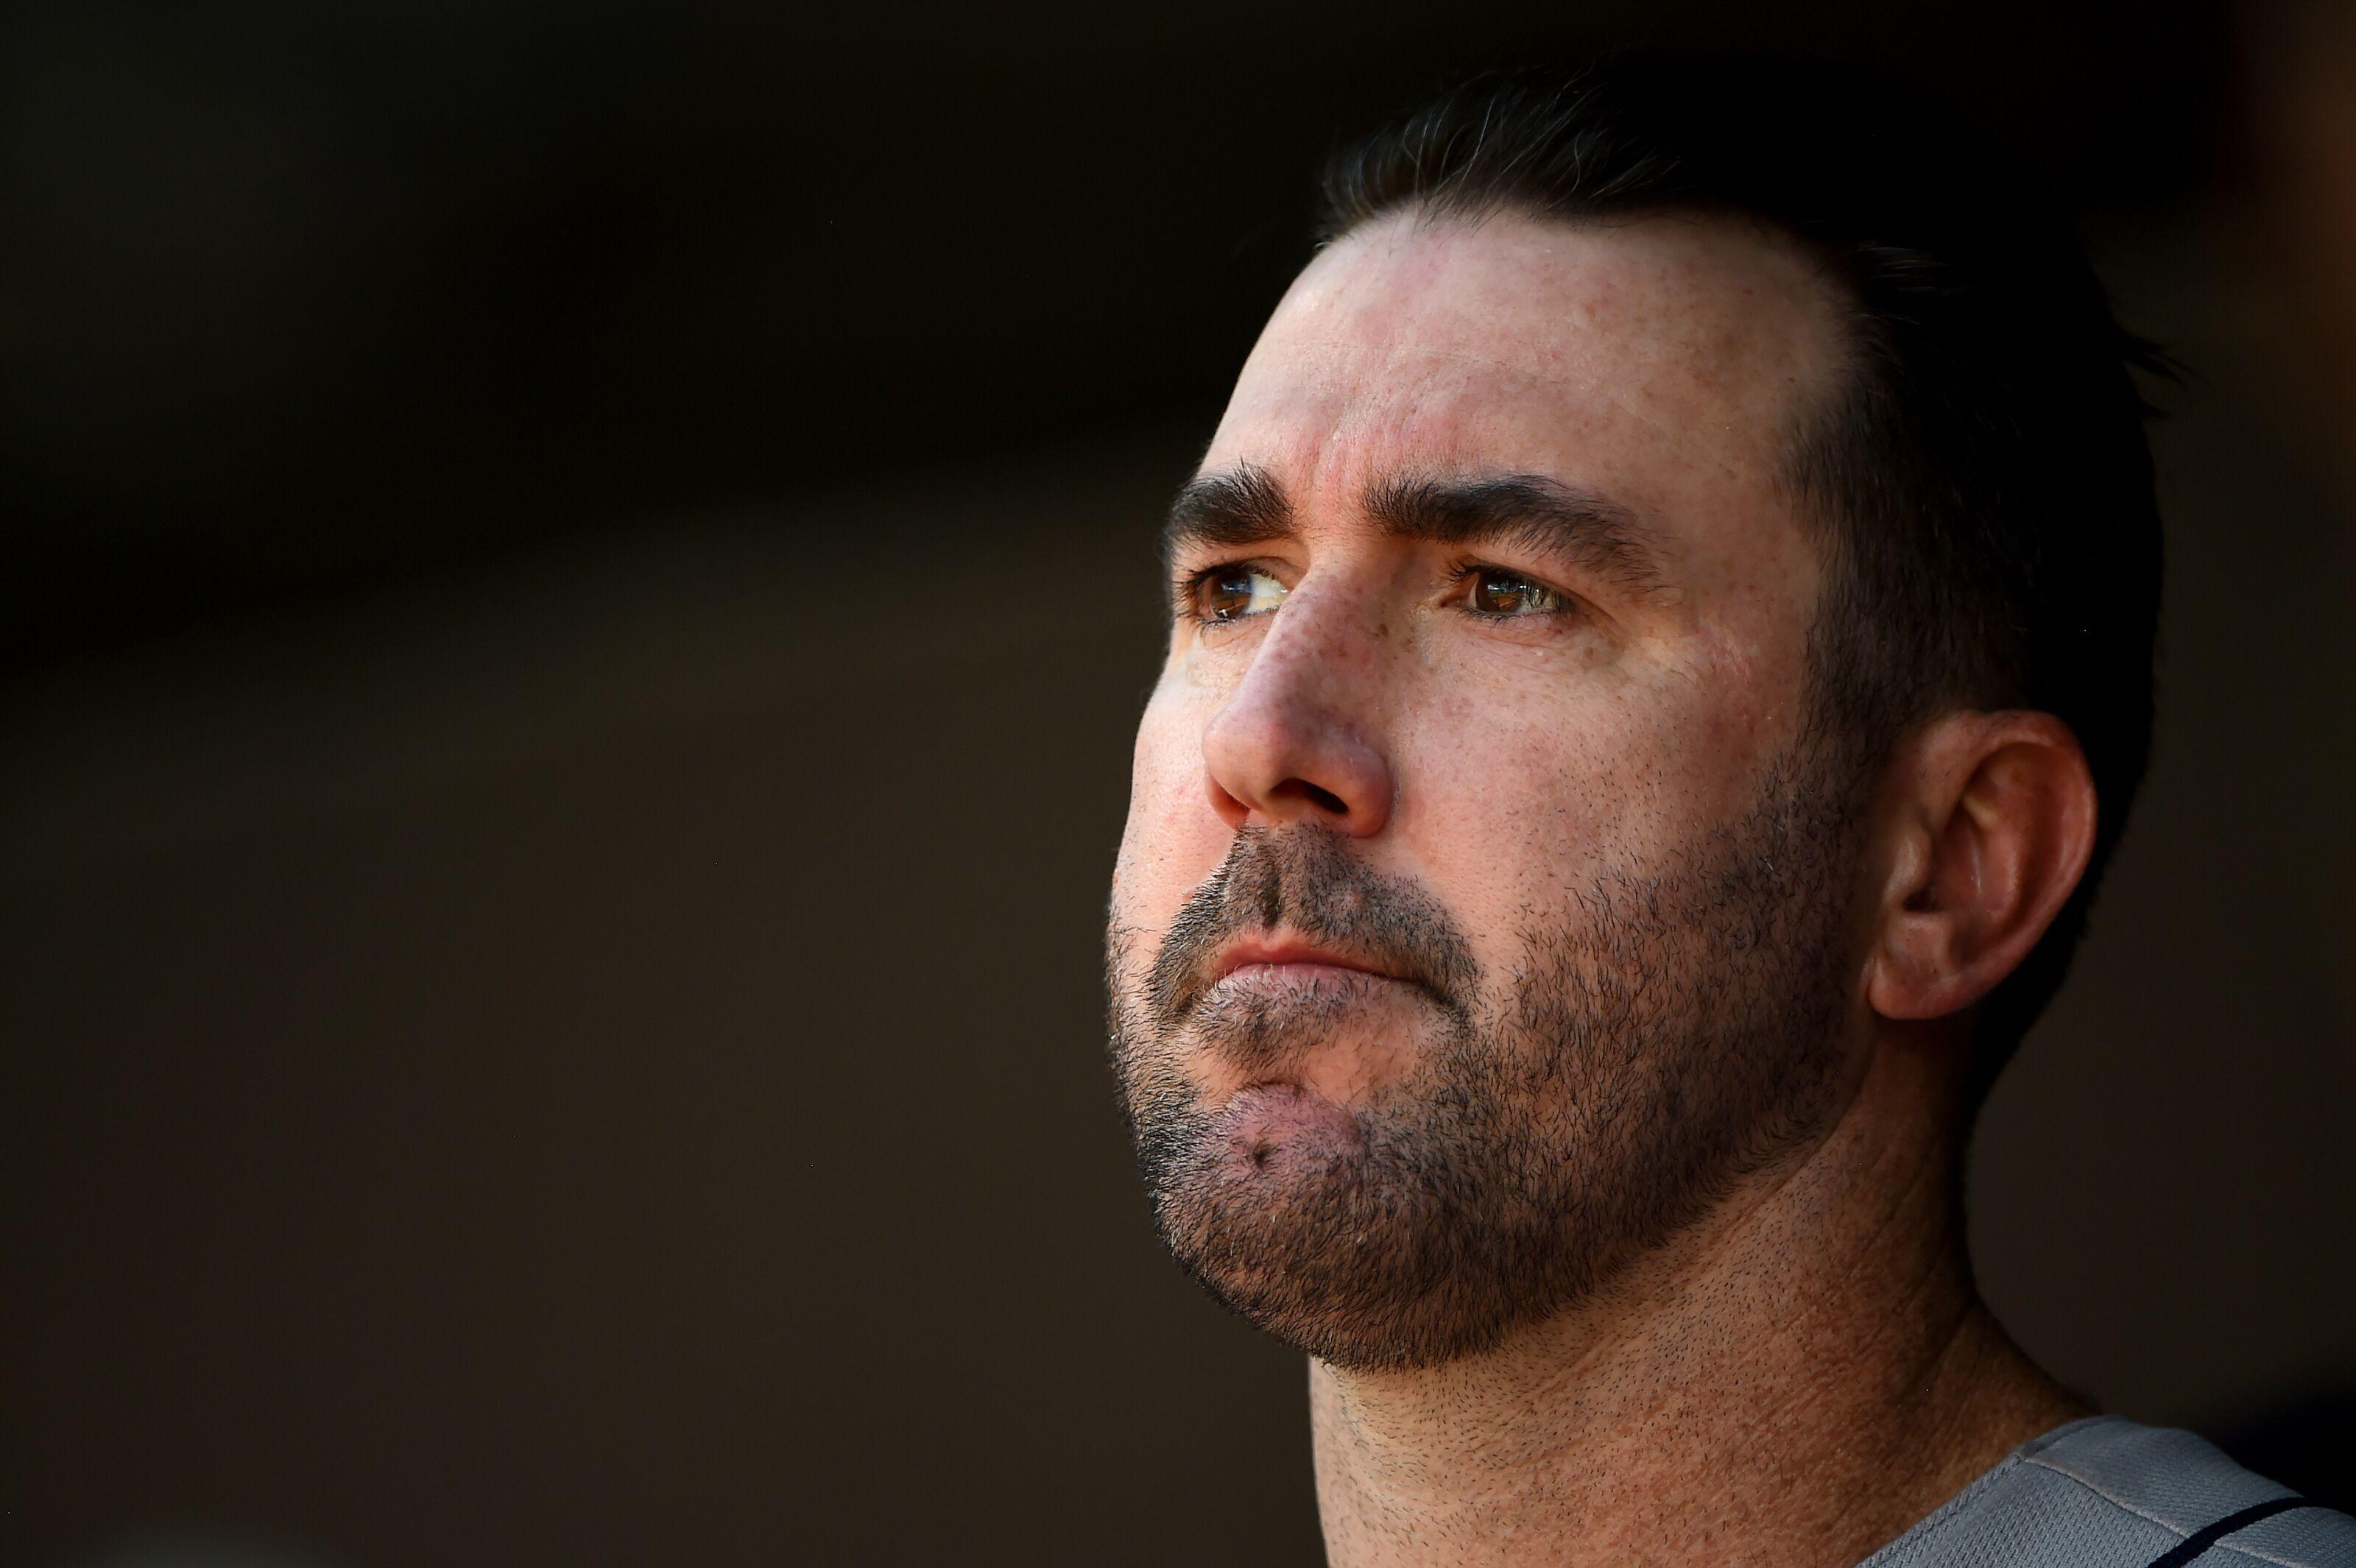 Astros: A Minor challenge to Justin Verlander for AL Cy Young